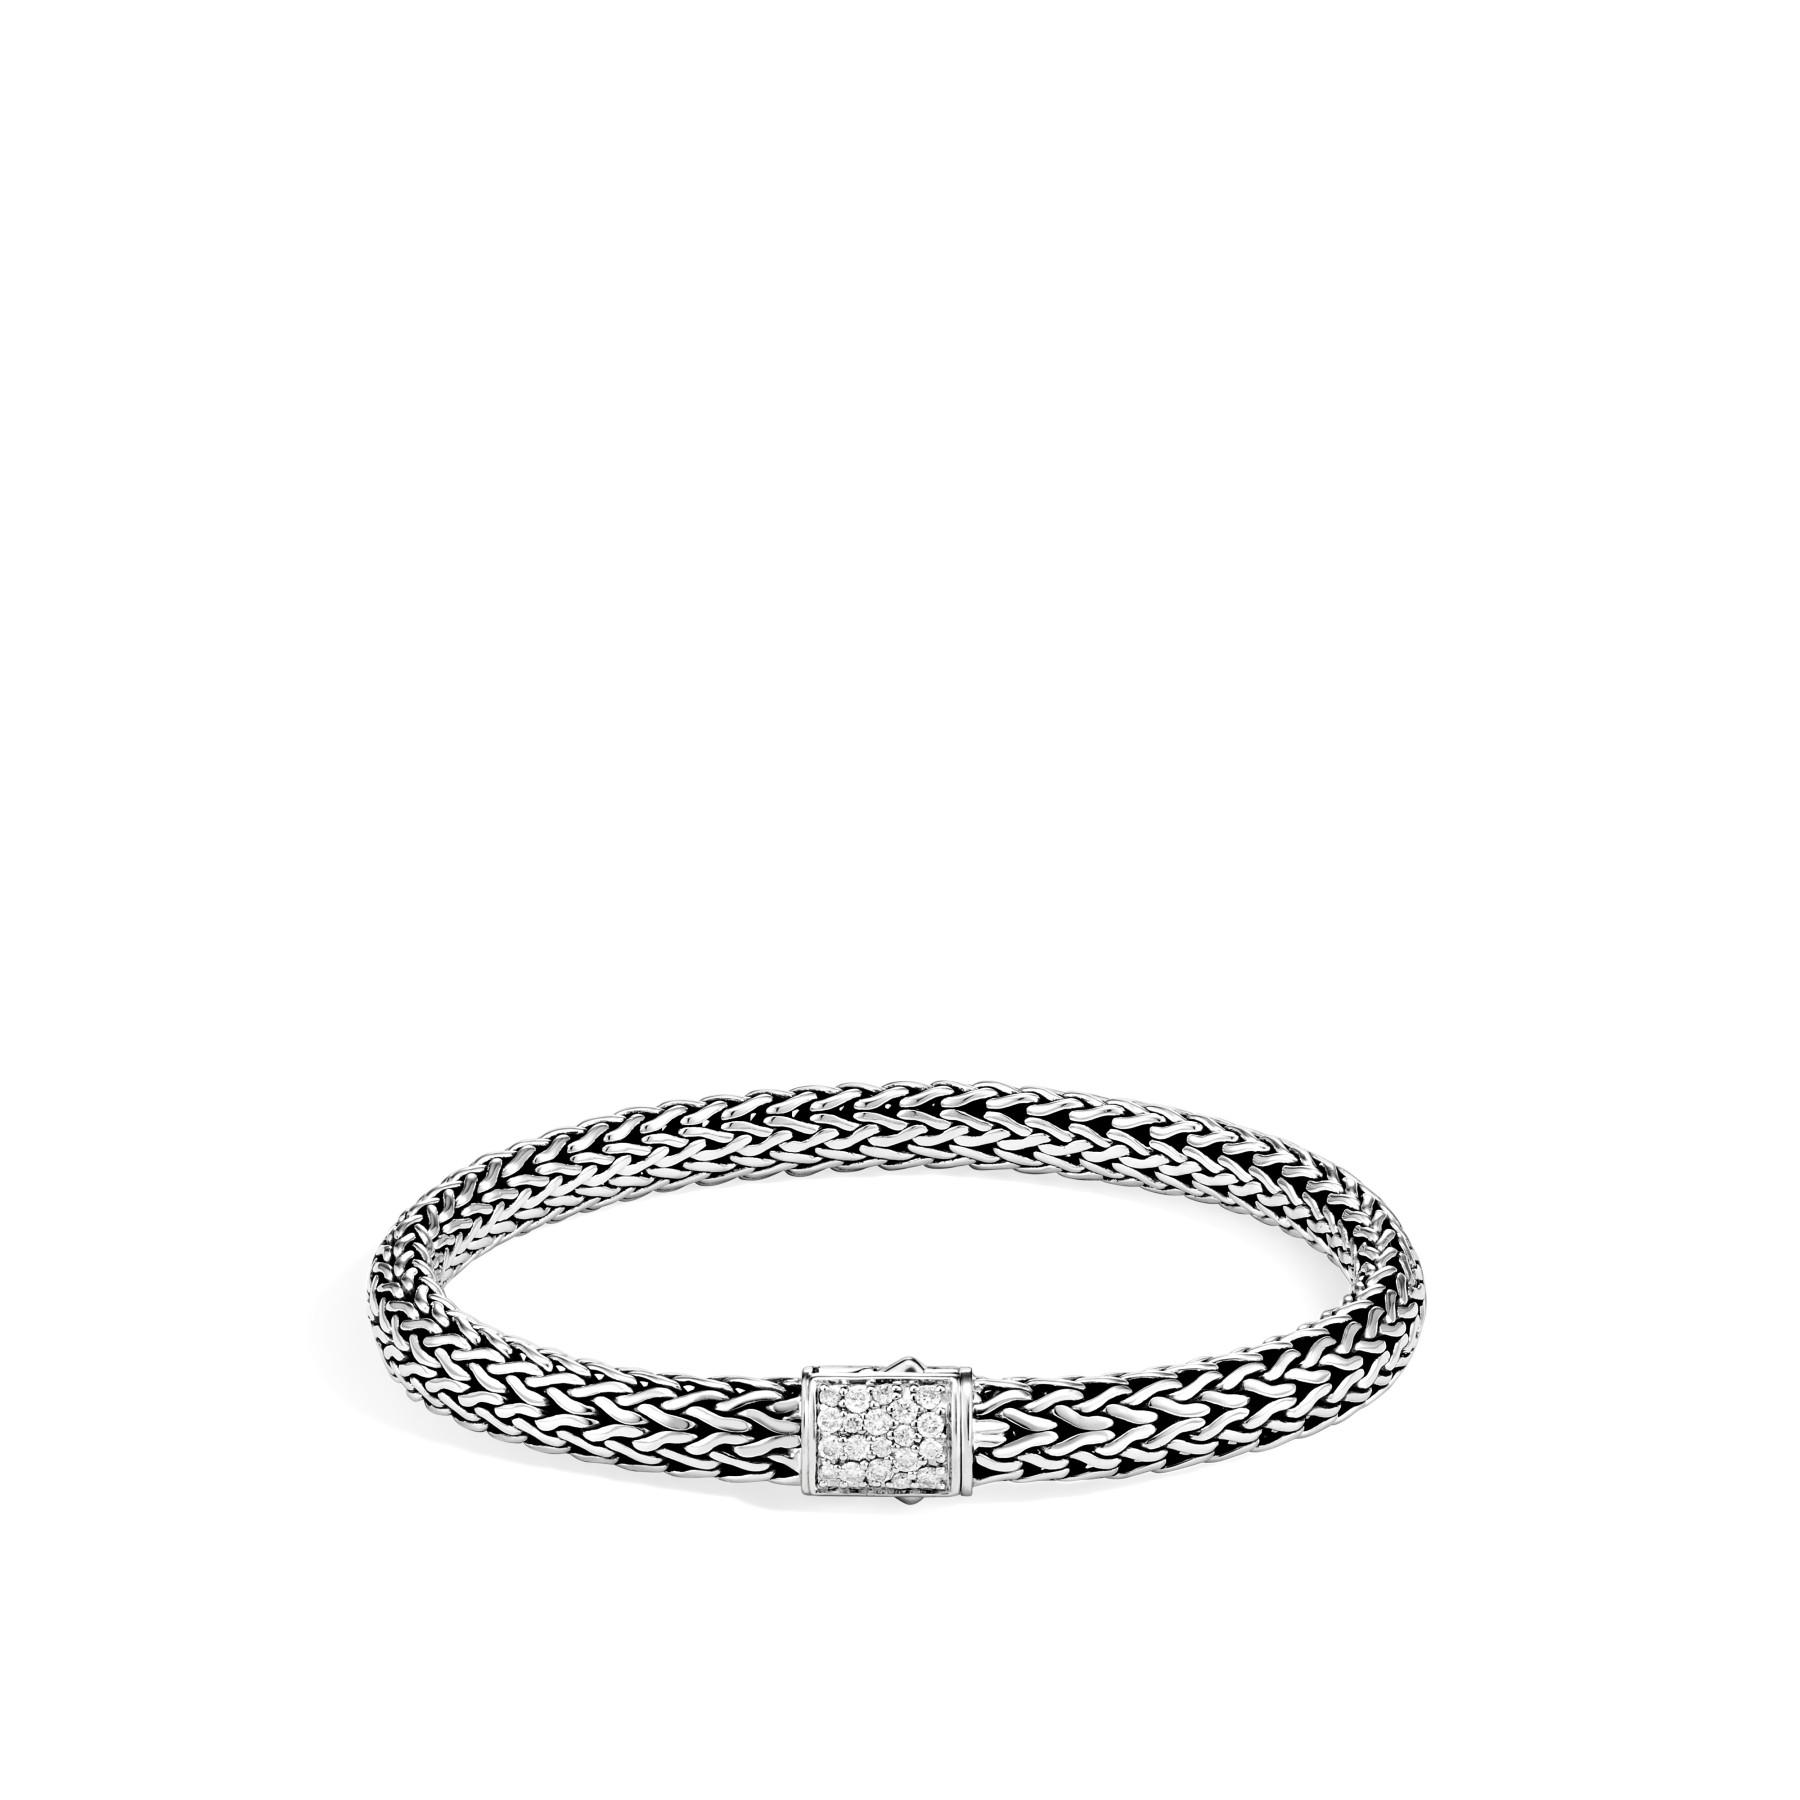 John Hardy Classic Chain Diamond and Aquamarine Bracelet - 6.5MM front image